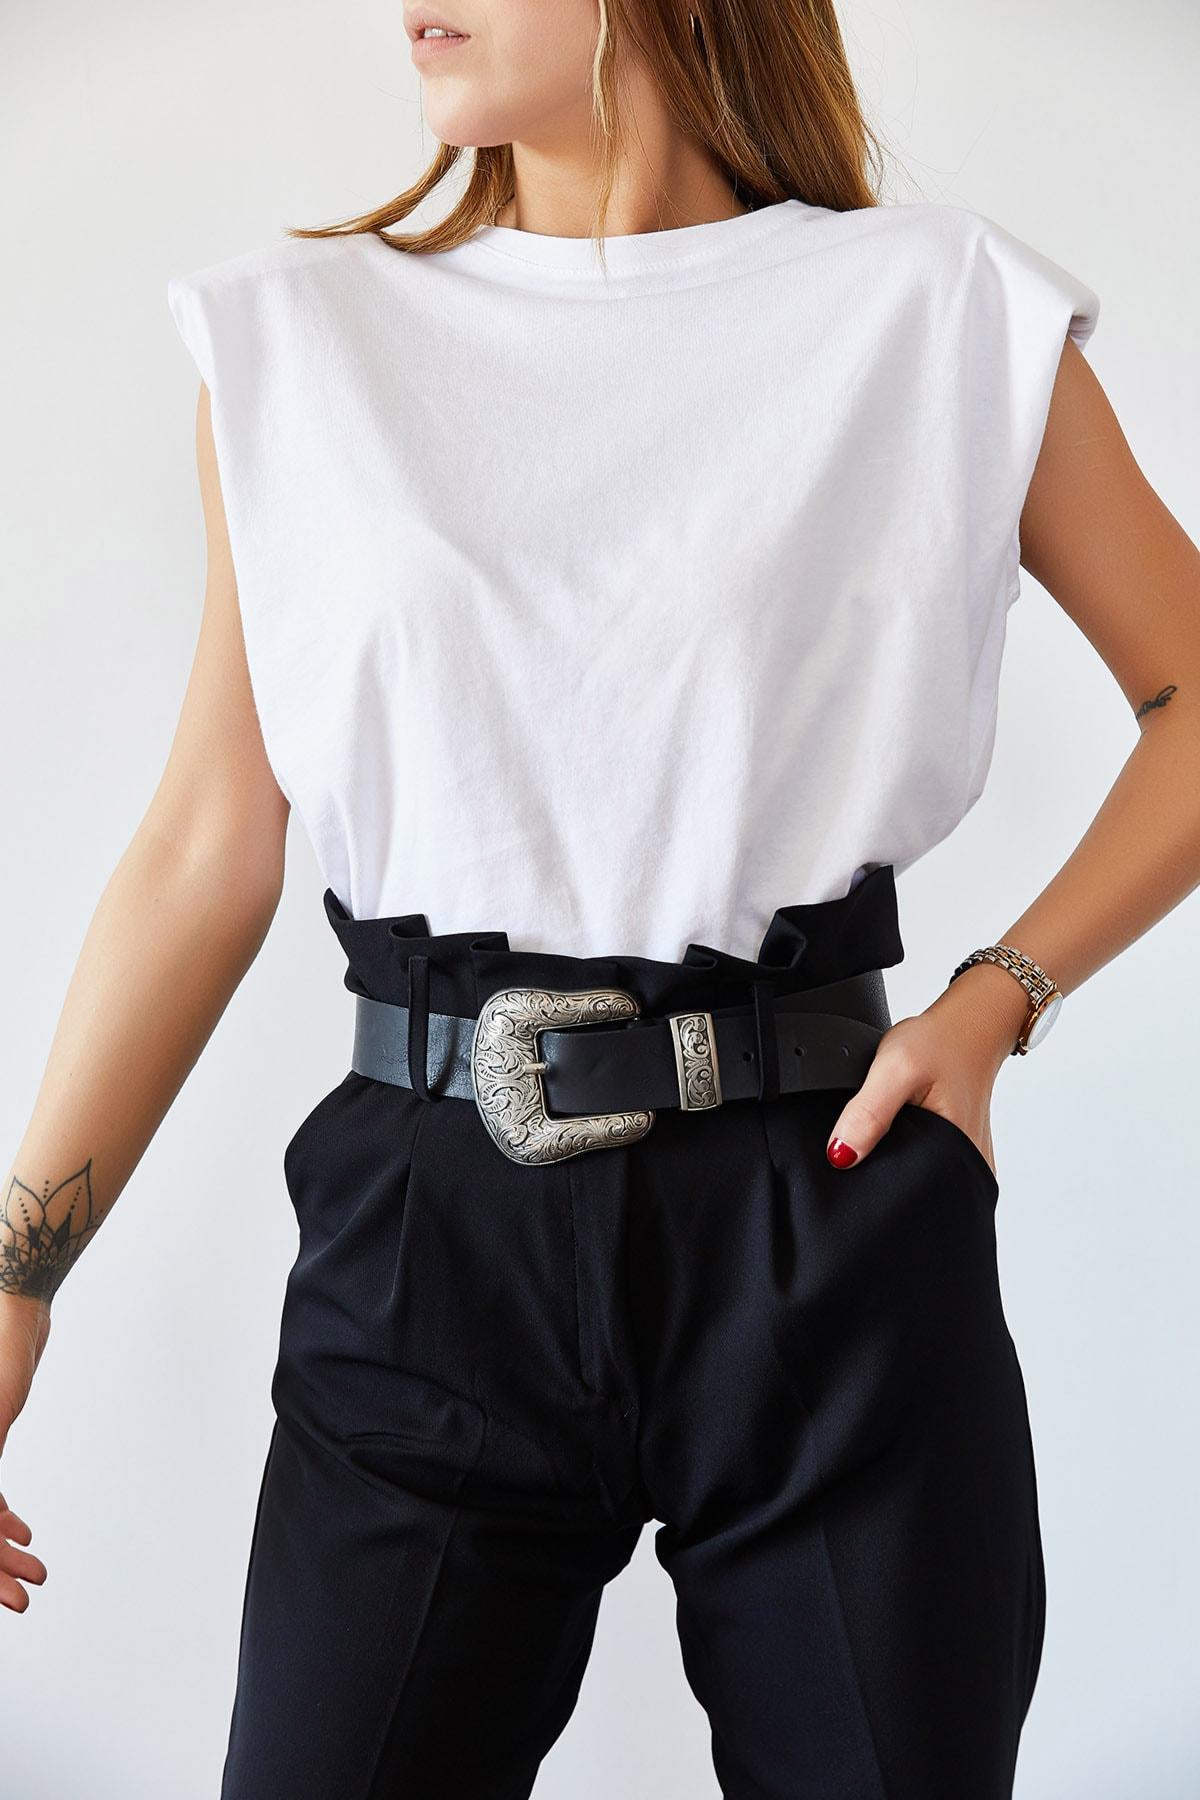 XHAN Vatkalı Basic Tişört 0YXK2-43401-01 2